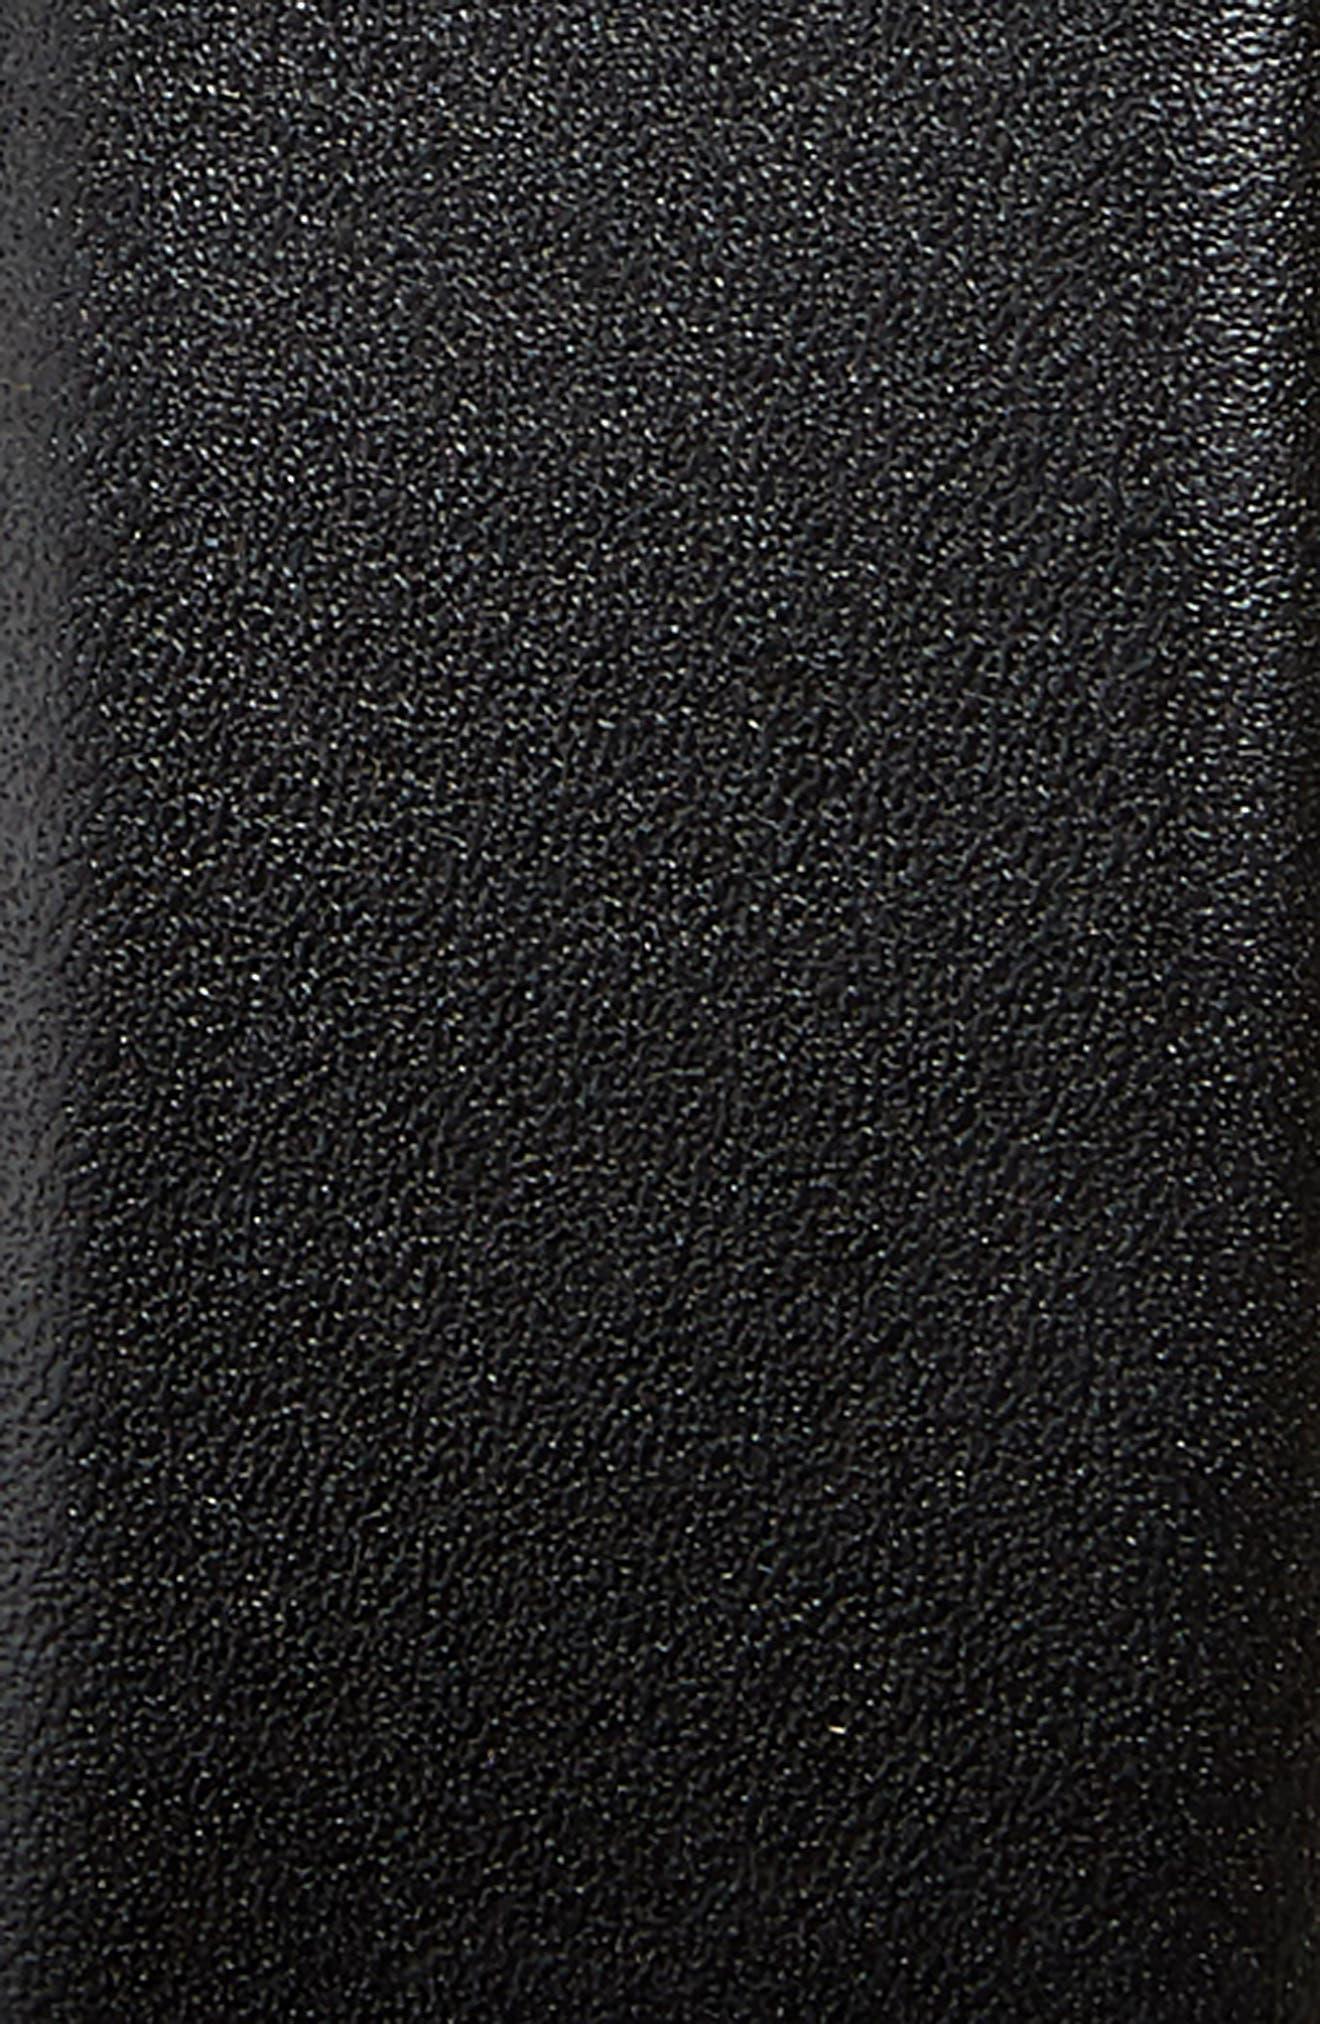 NORDSTROM MEN'S SHOP,                             Pullman Leather Belt,                             Alternate thumbnail 2, color,                             001